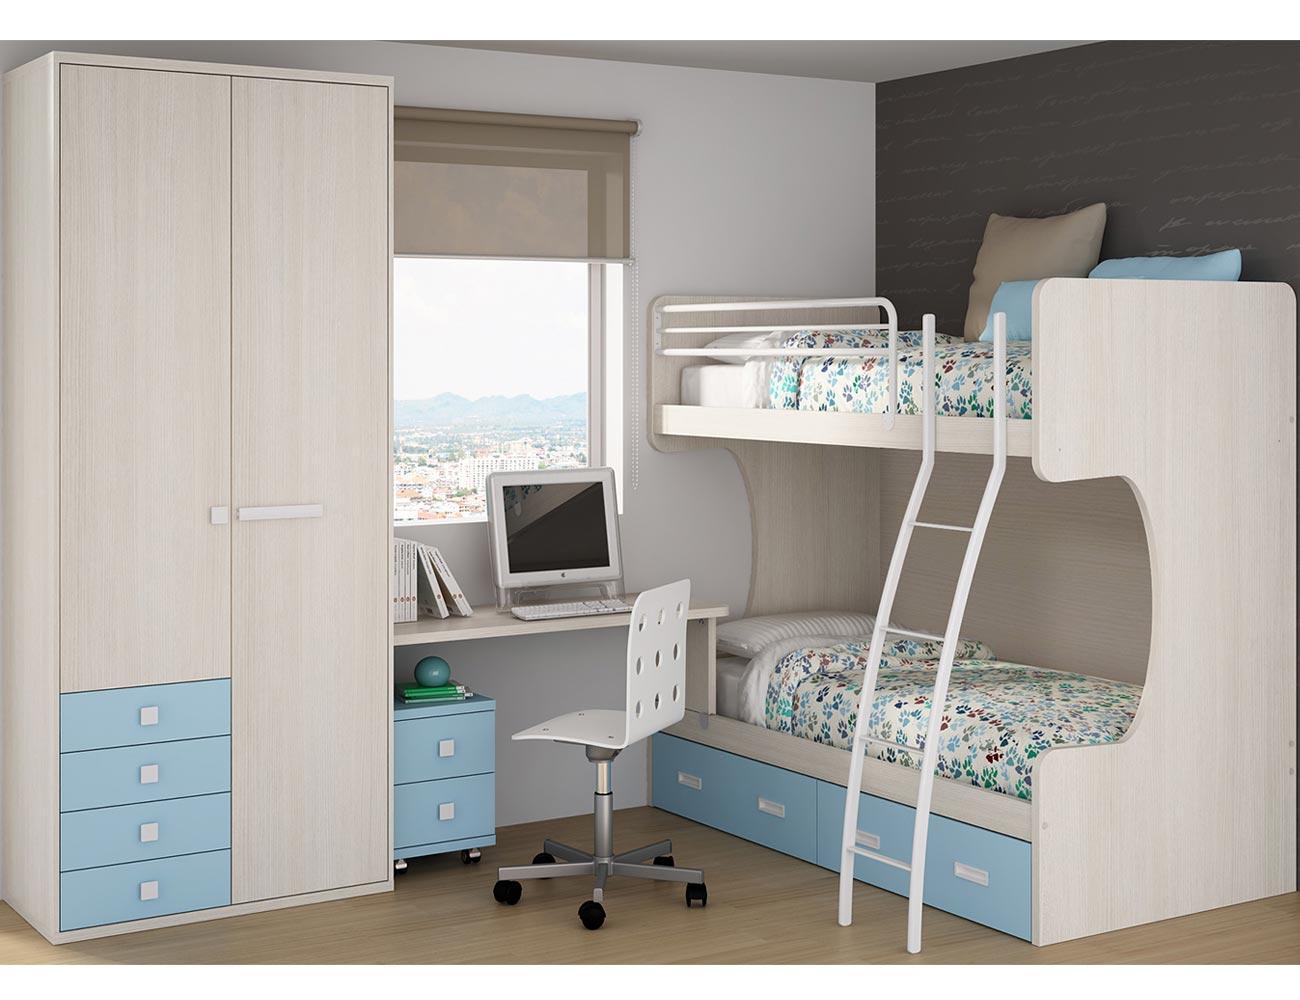 Dormitorio juvenil armario celeste